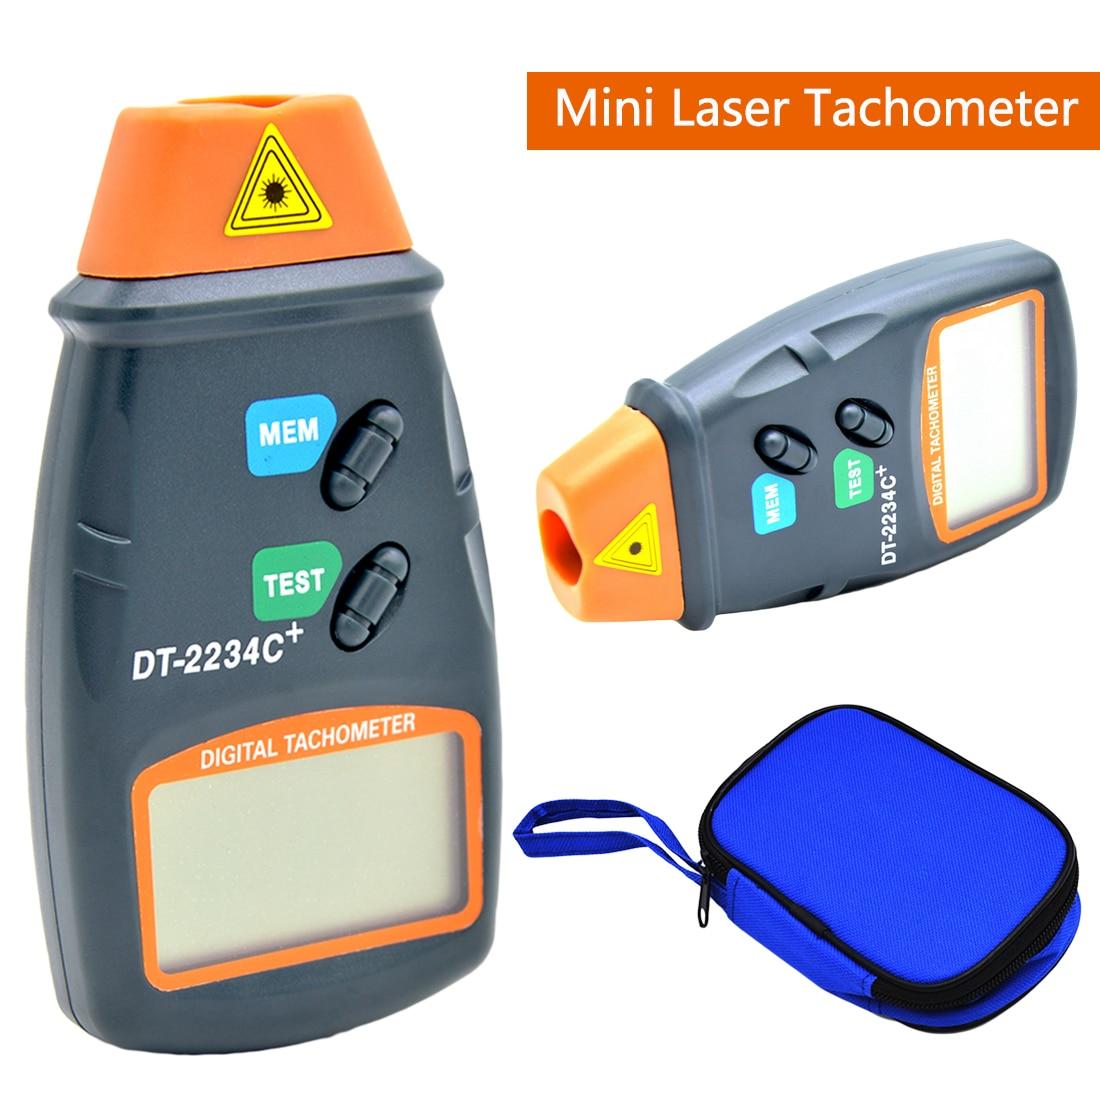 2.5RPM -99,999RPM Non Contact Tach Tool Handheld Digital Laser Photo Tachometer Tester RPM Motors DC 9V